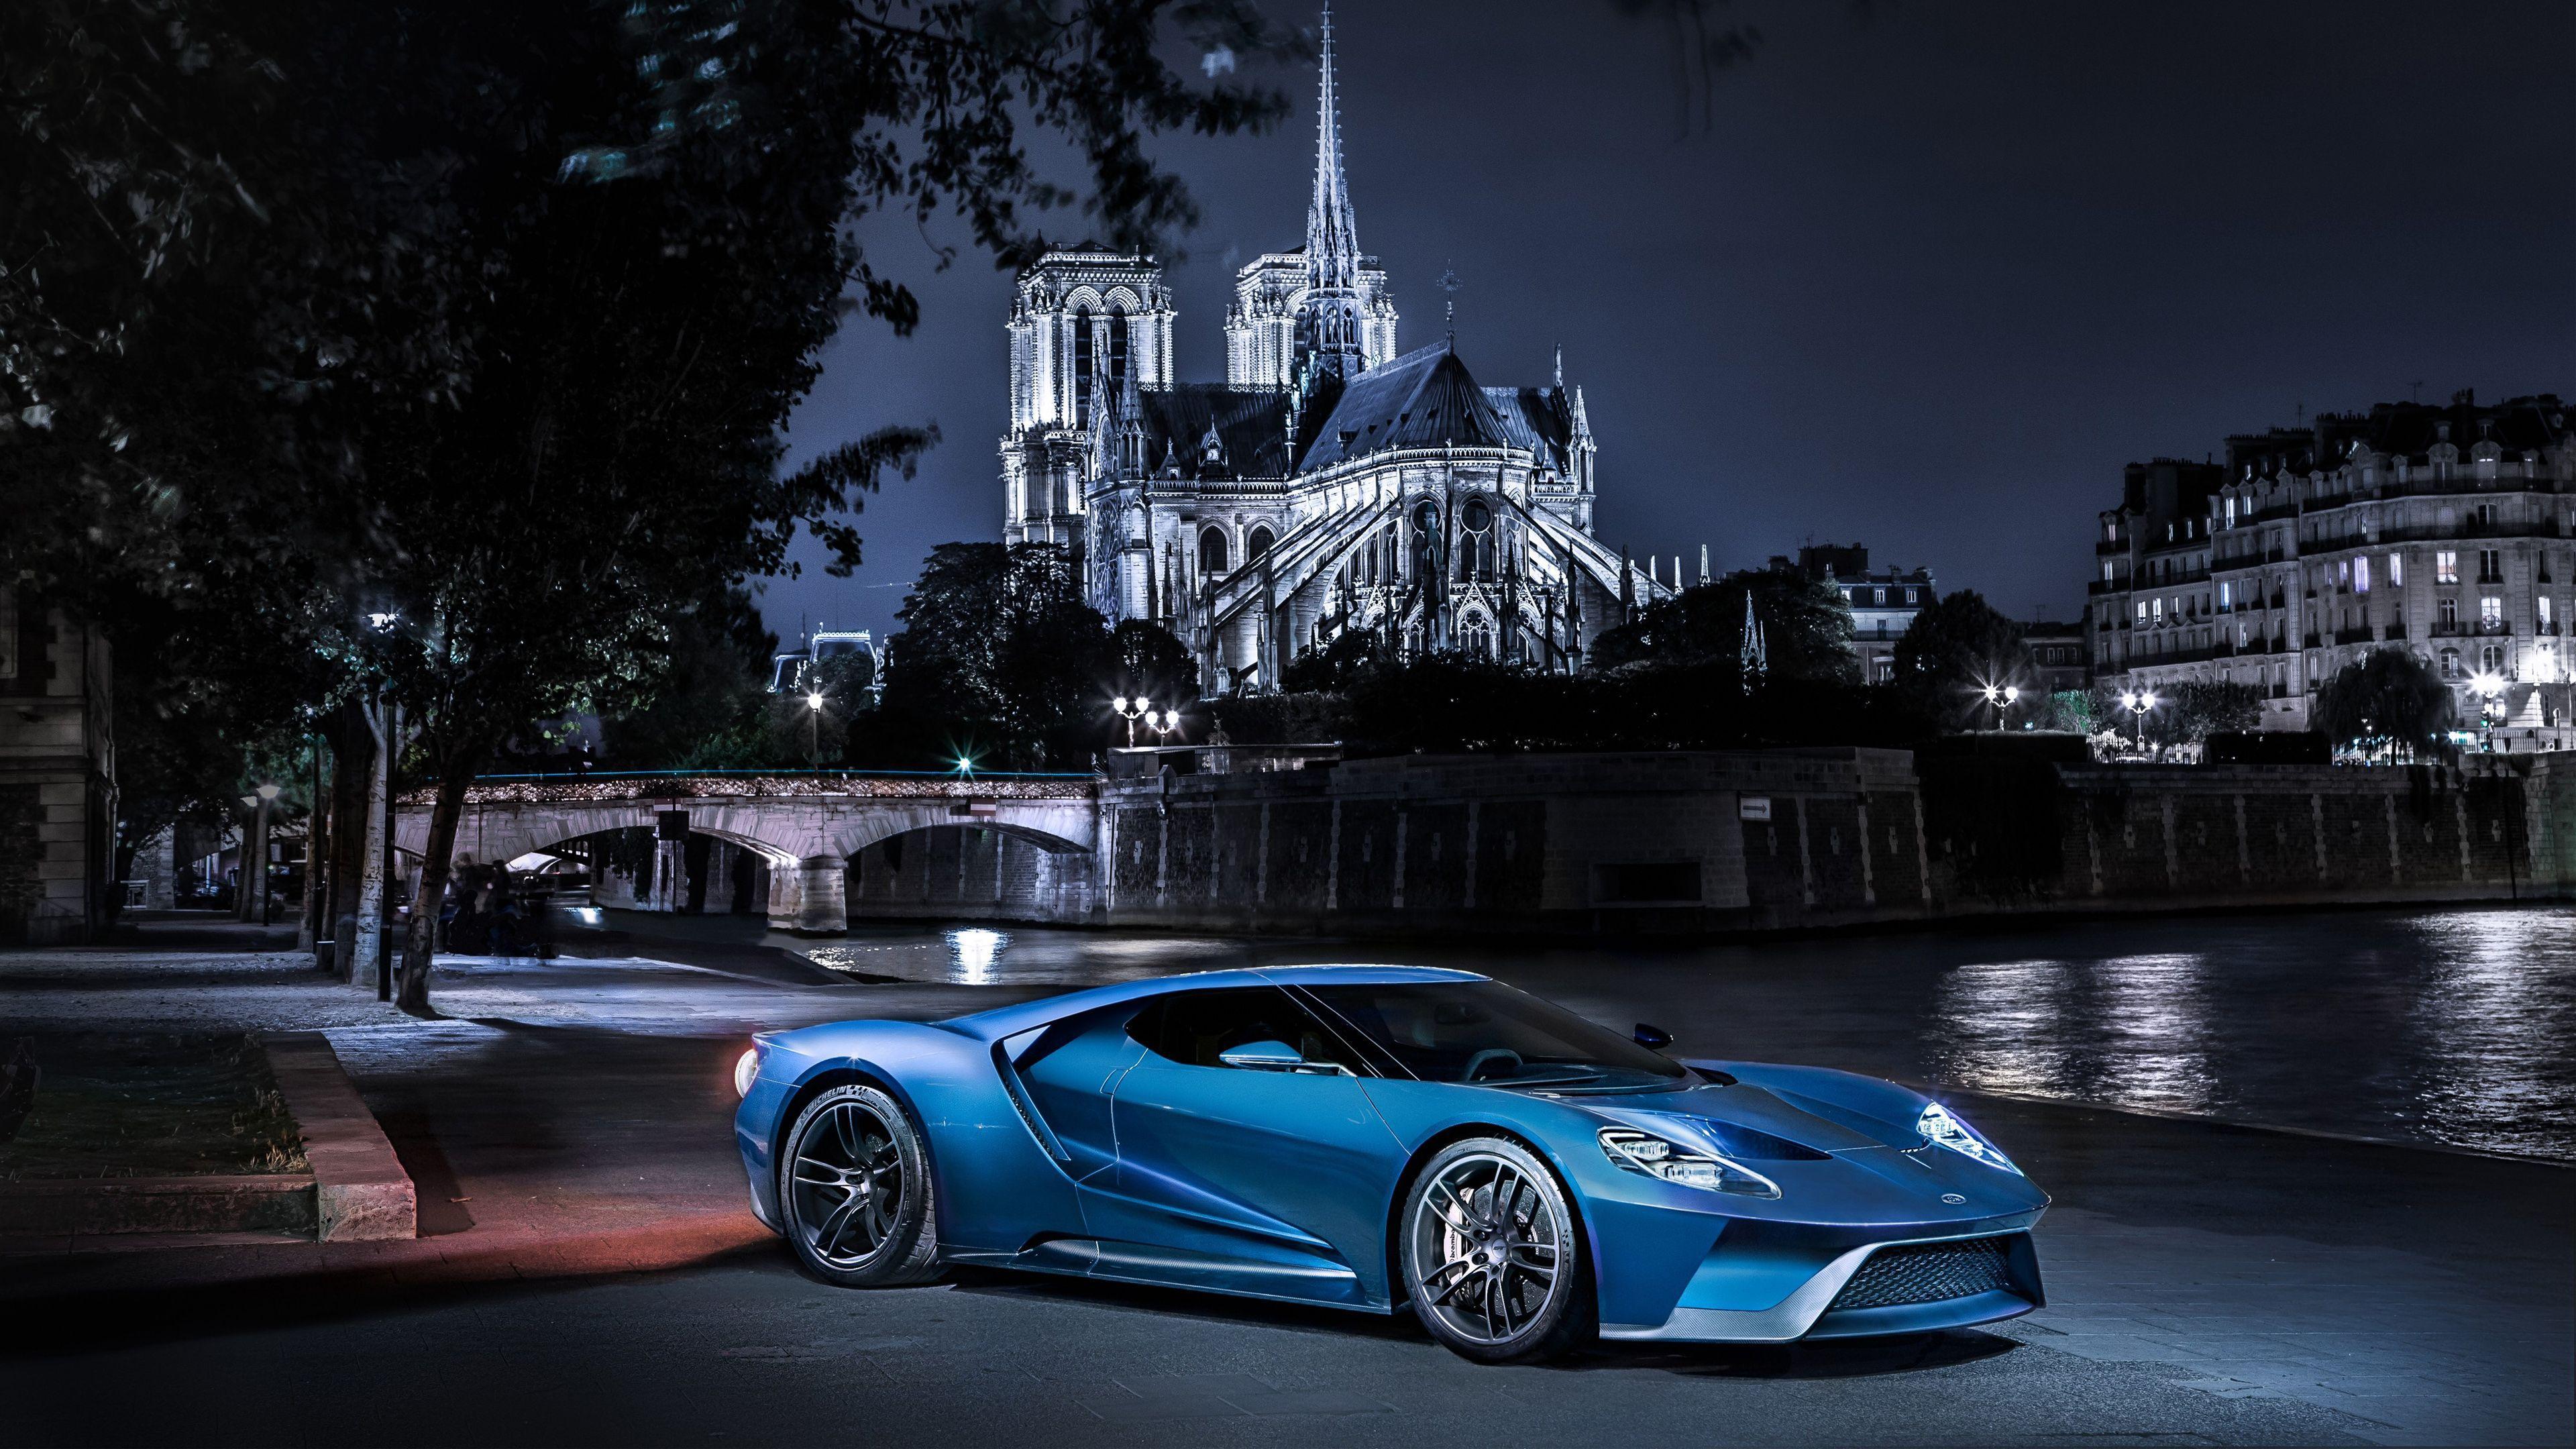 Super Car Wallpapers Top Free Super Car Backgrounds